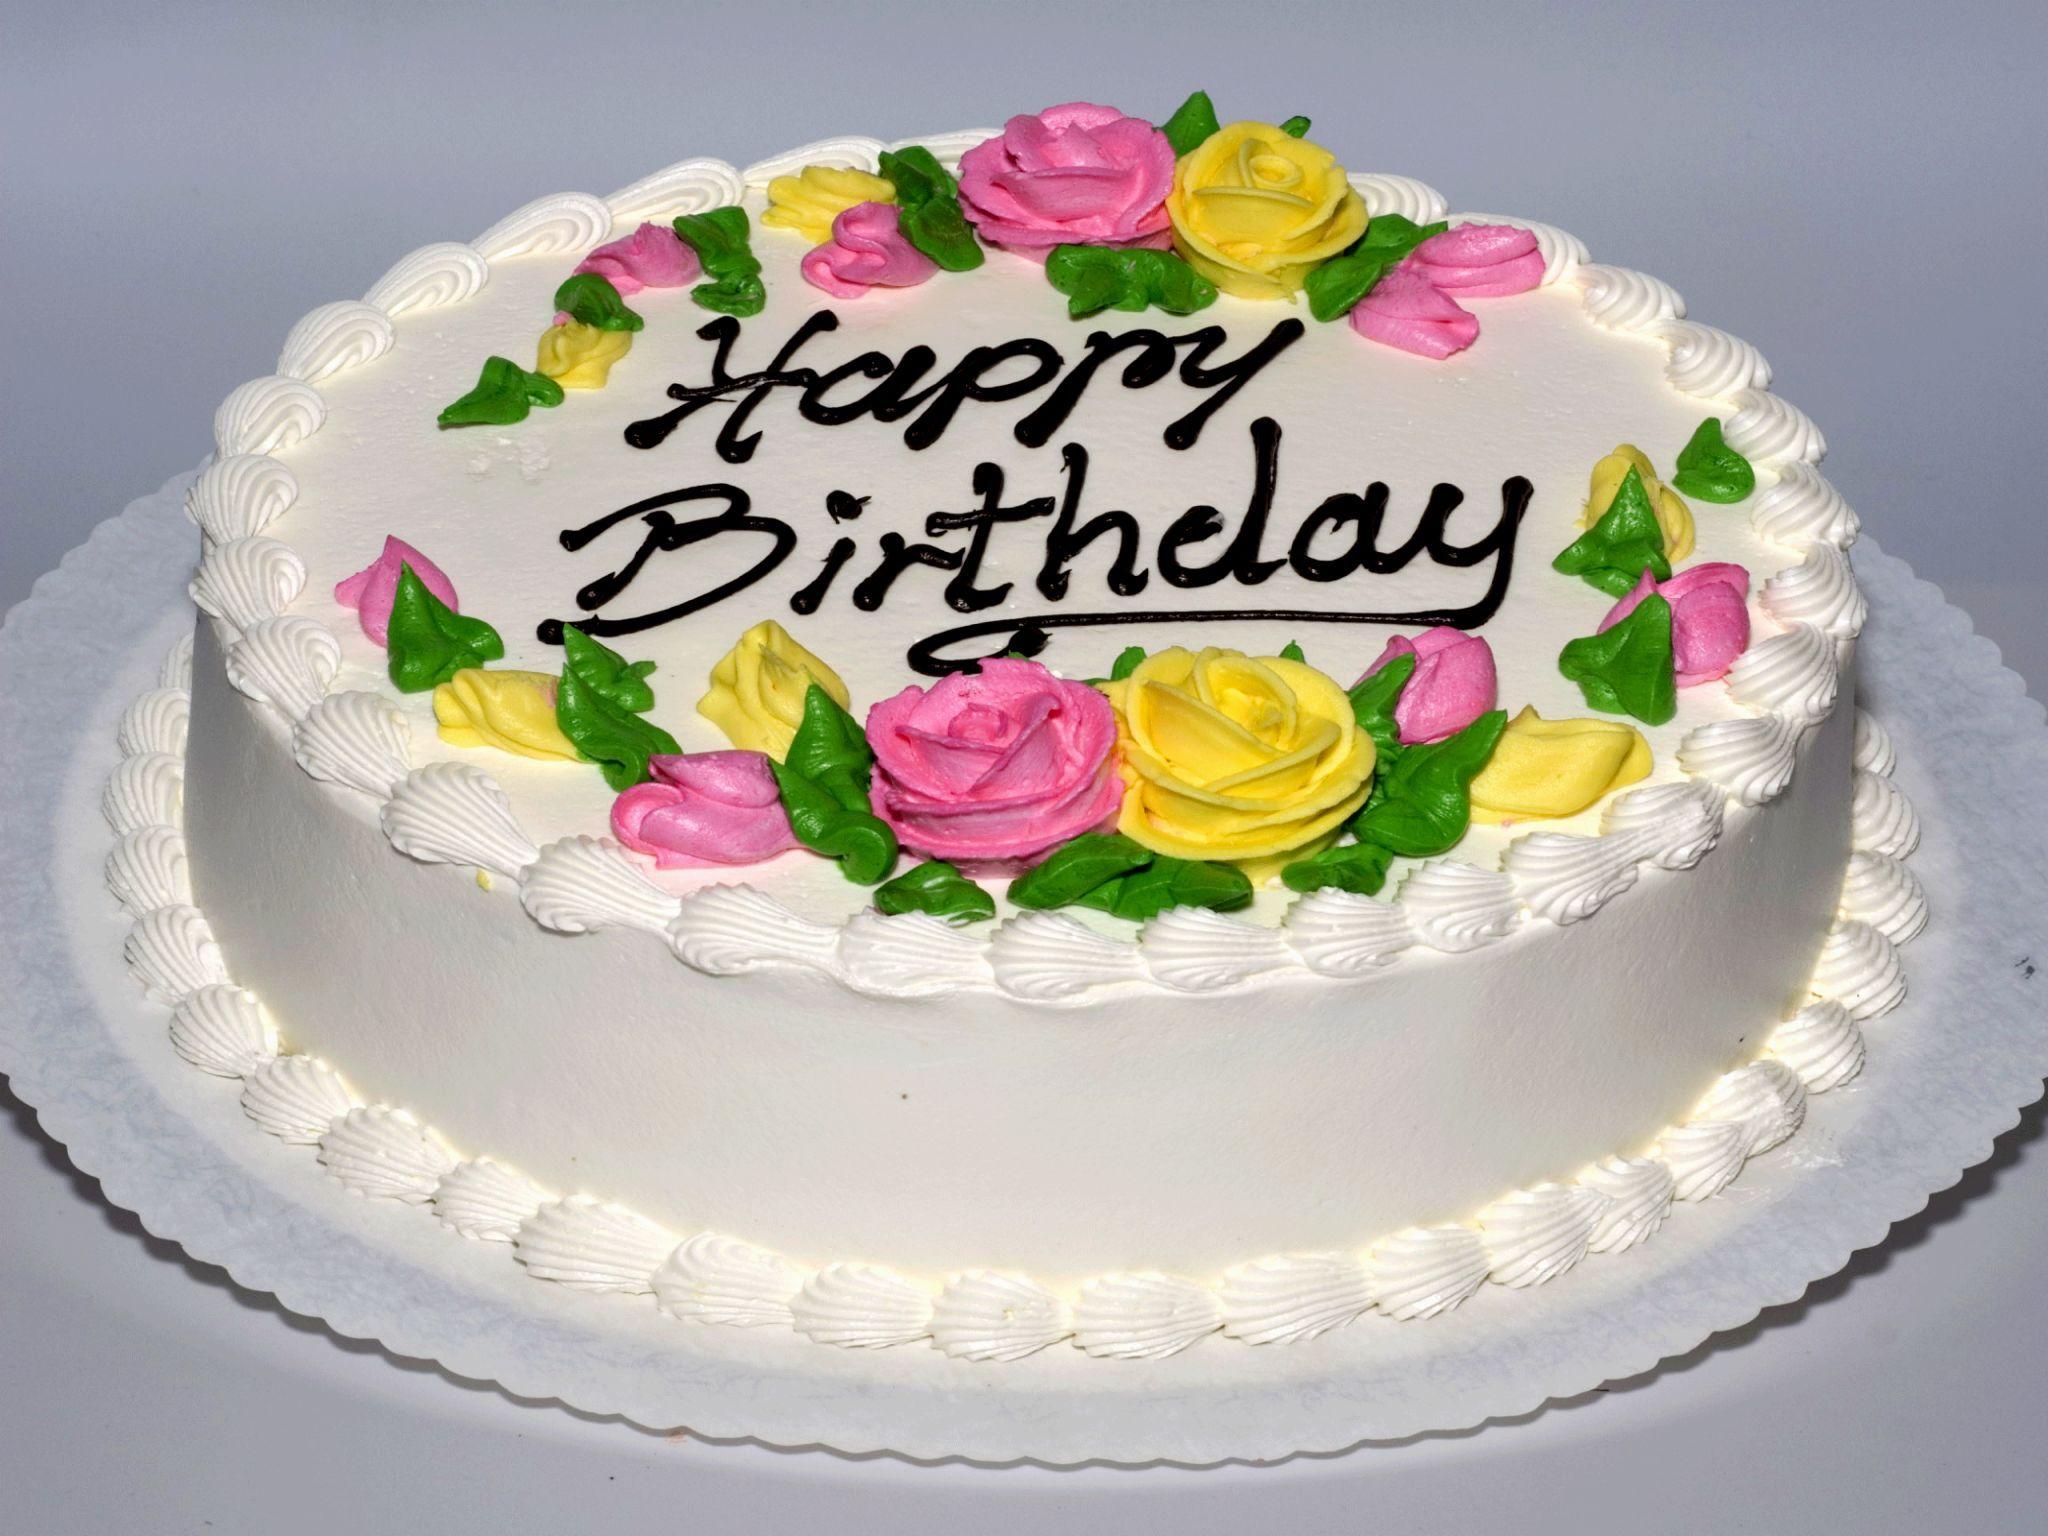 Pin by princess ann on birthday wish Pinterest Birthdays